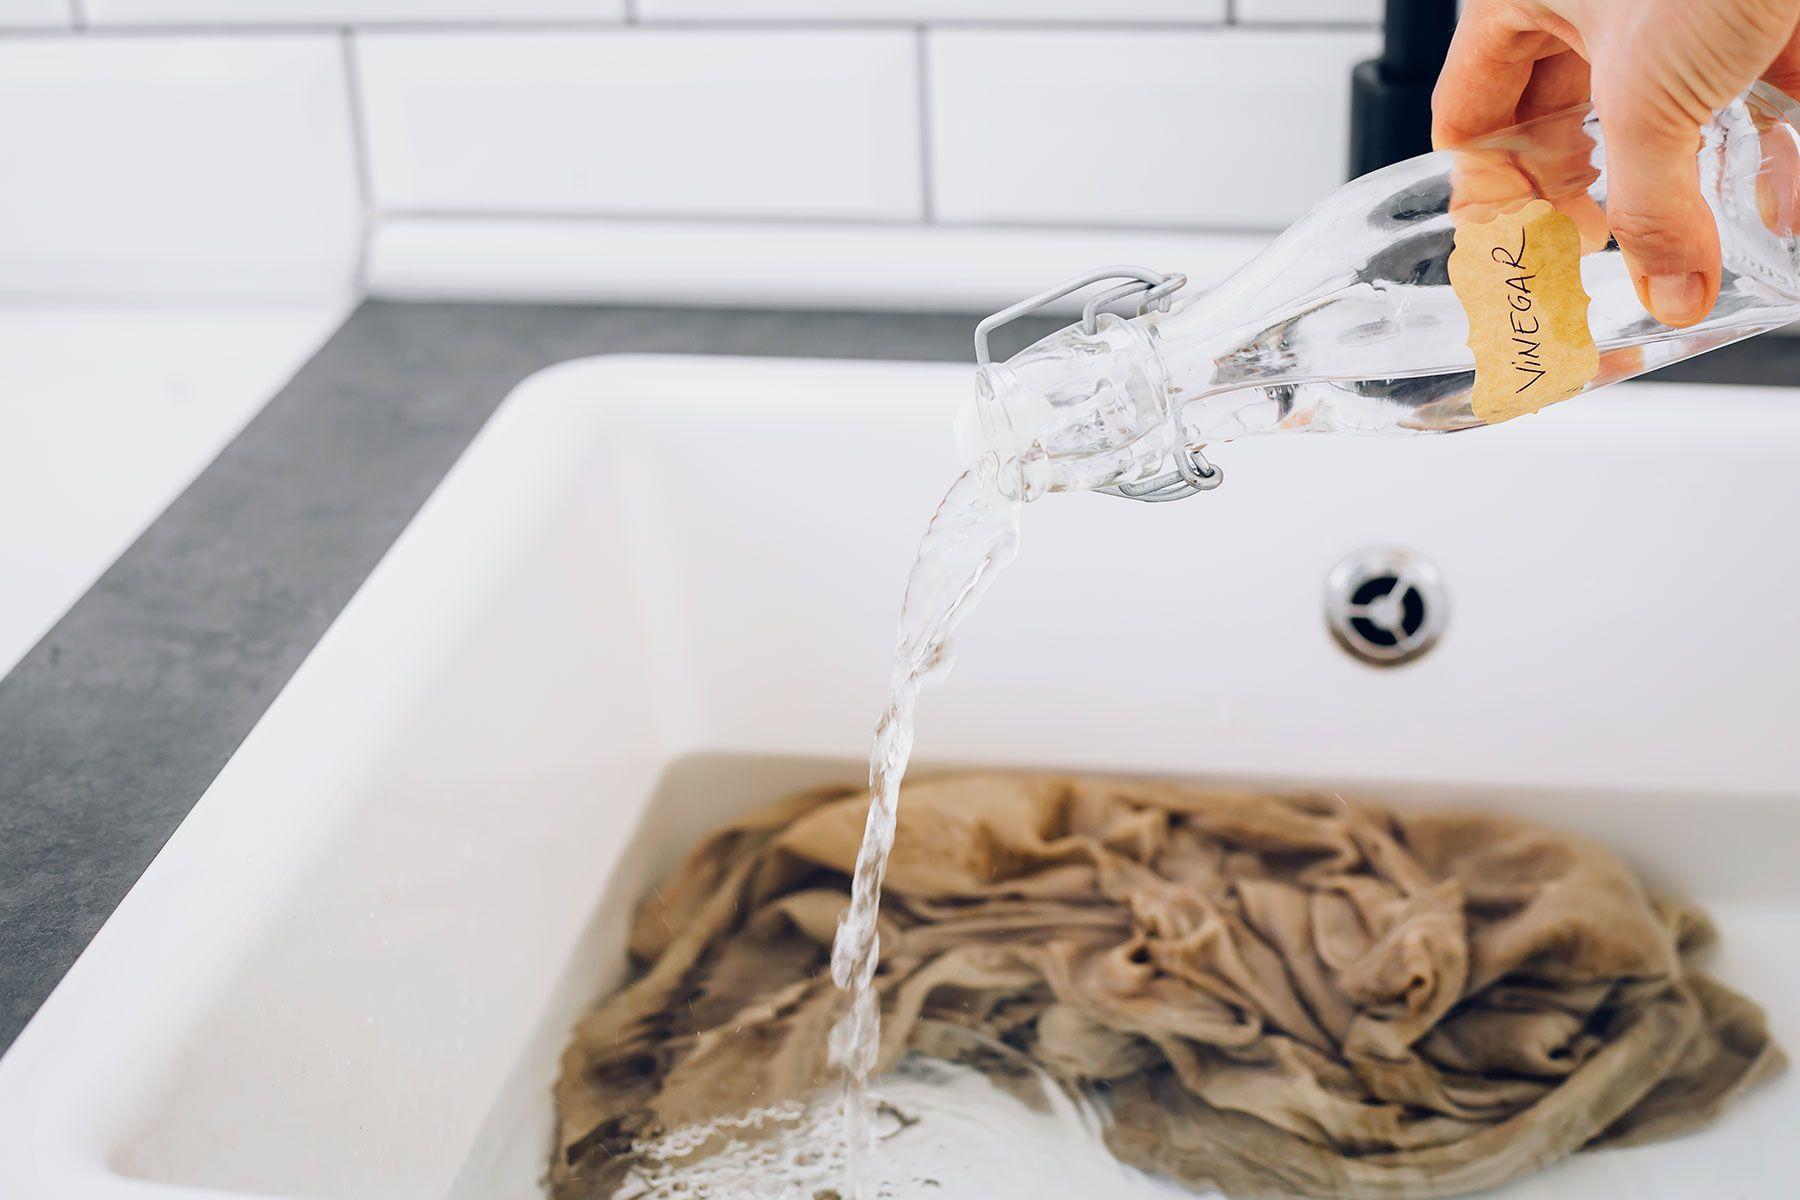 woman hand-washing a garment and adding vinegar